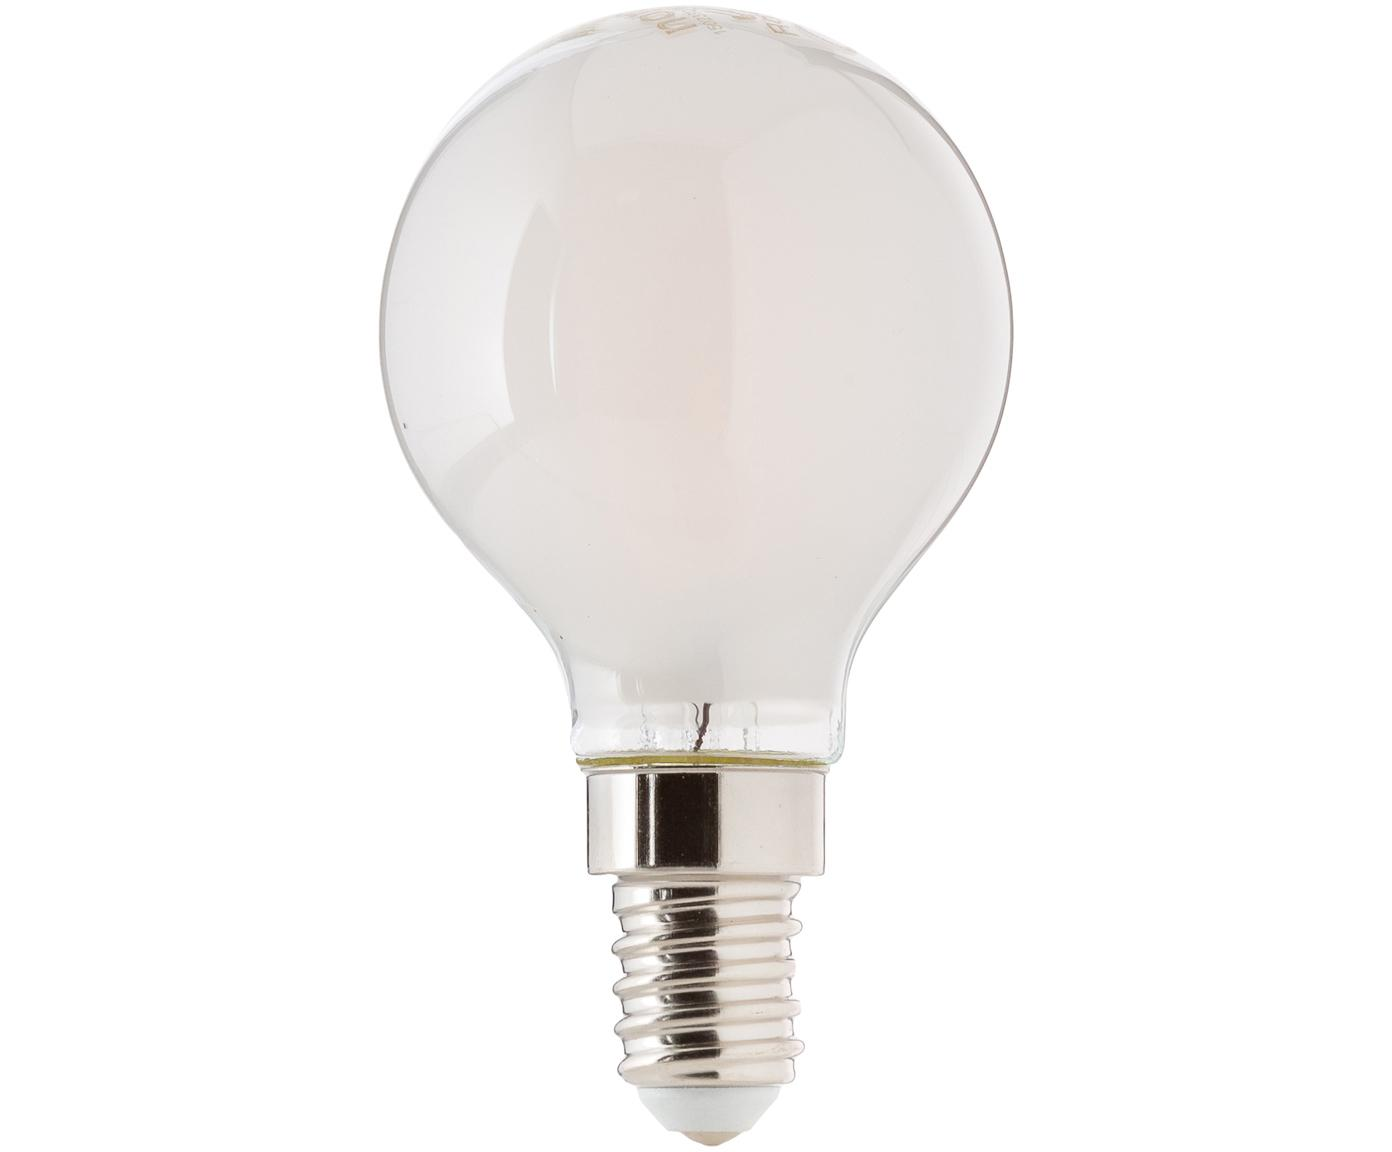 Lamp Sedim (E14 / 2W), Peertje: kunststof, Fitting: aluminium, Wit, Ø 5 x H 8 cm